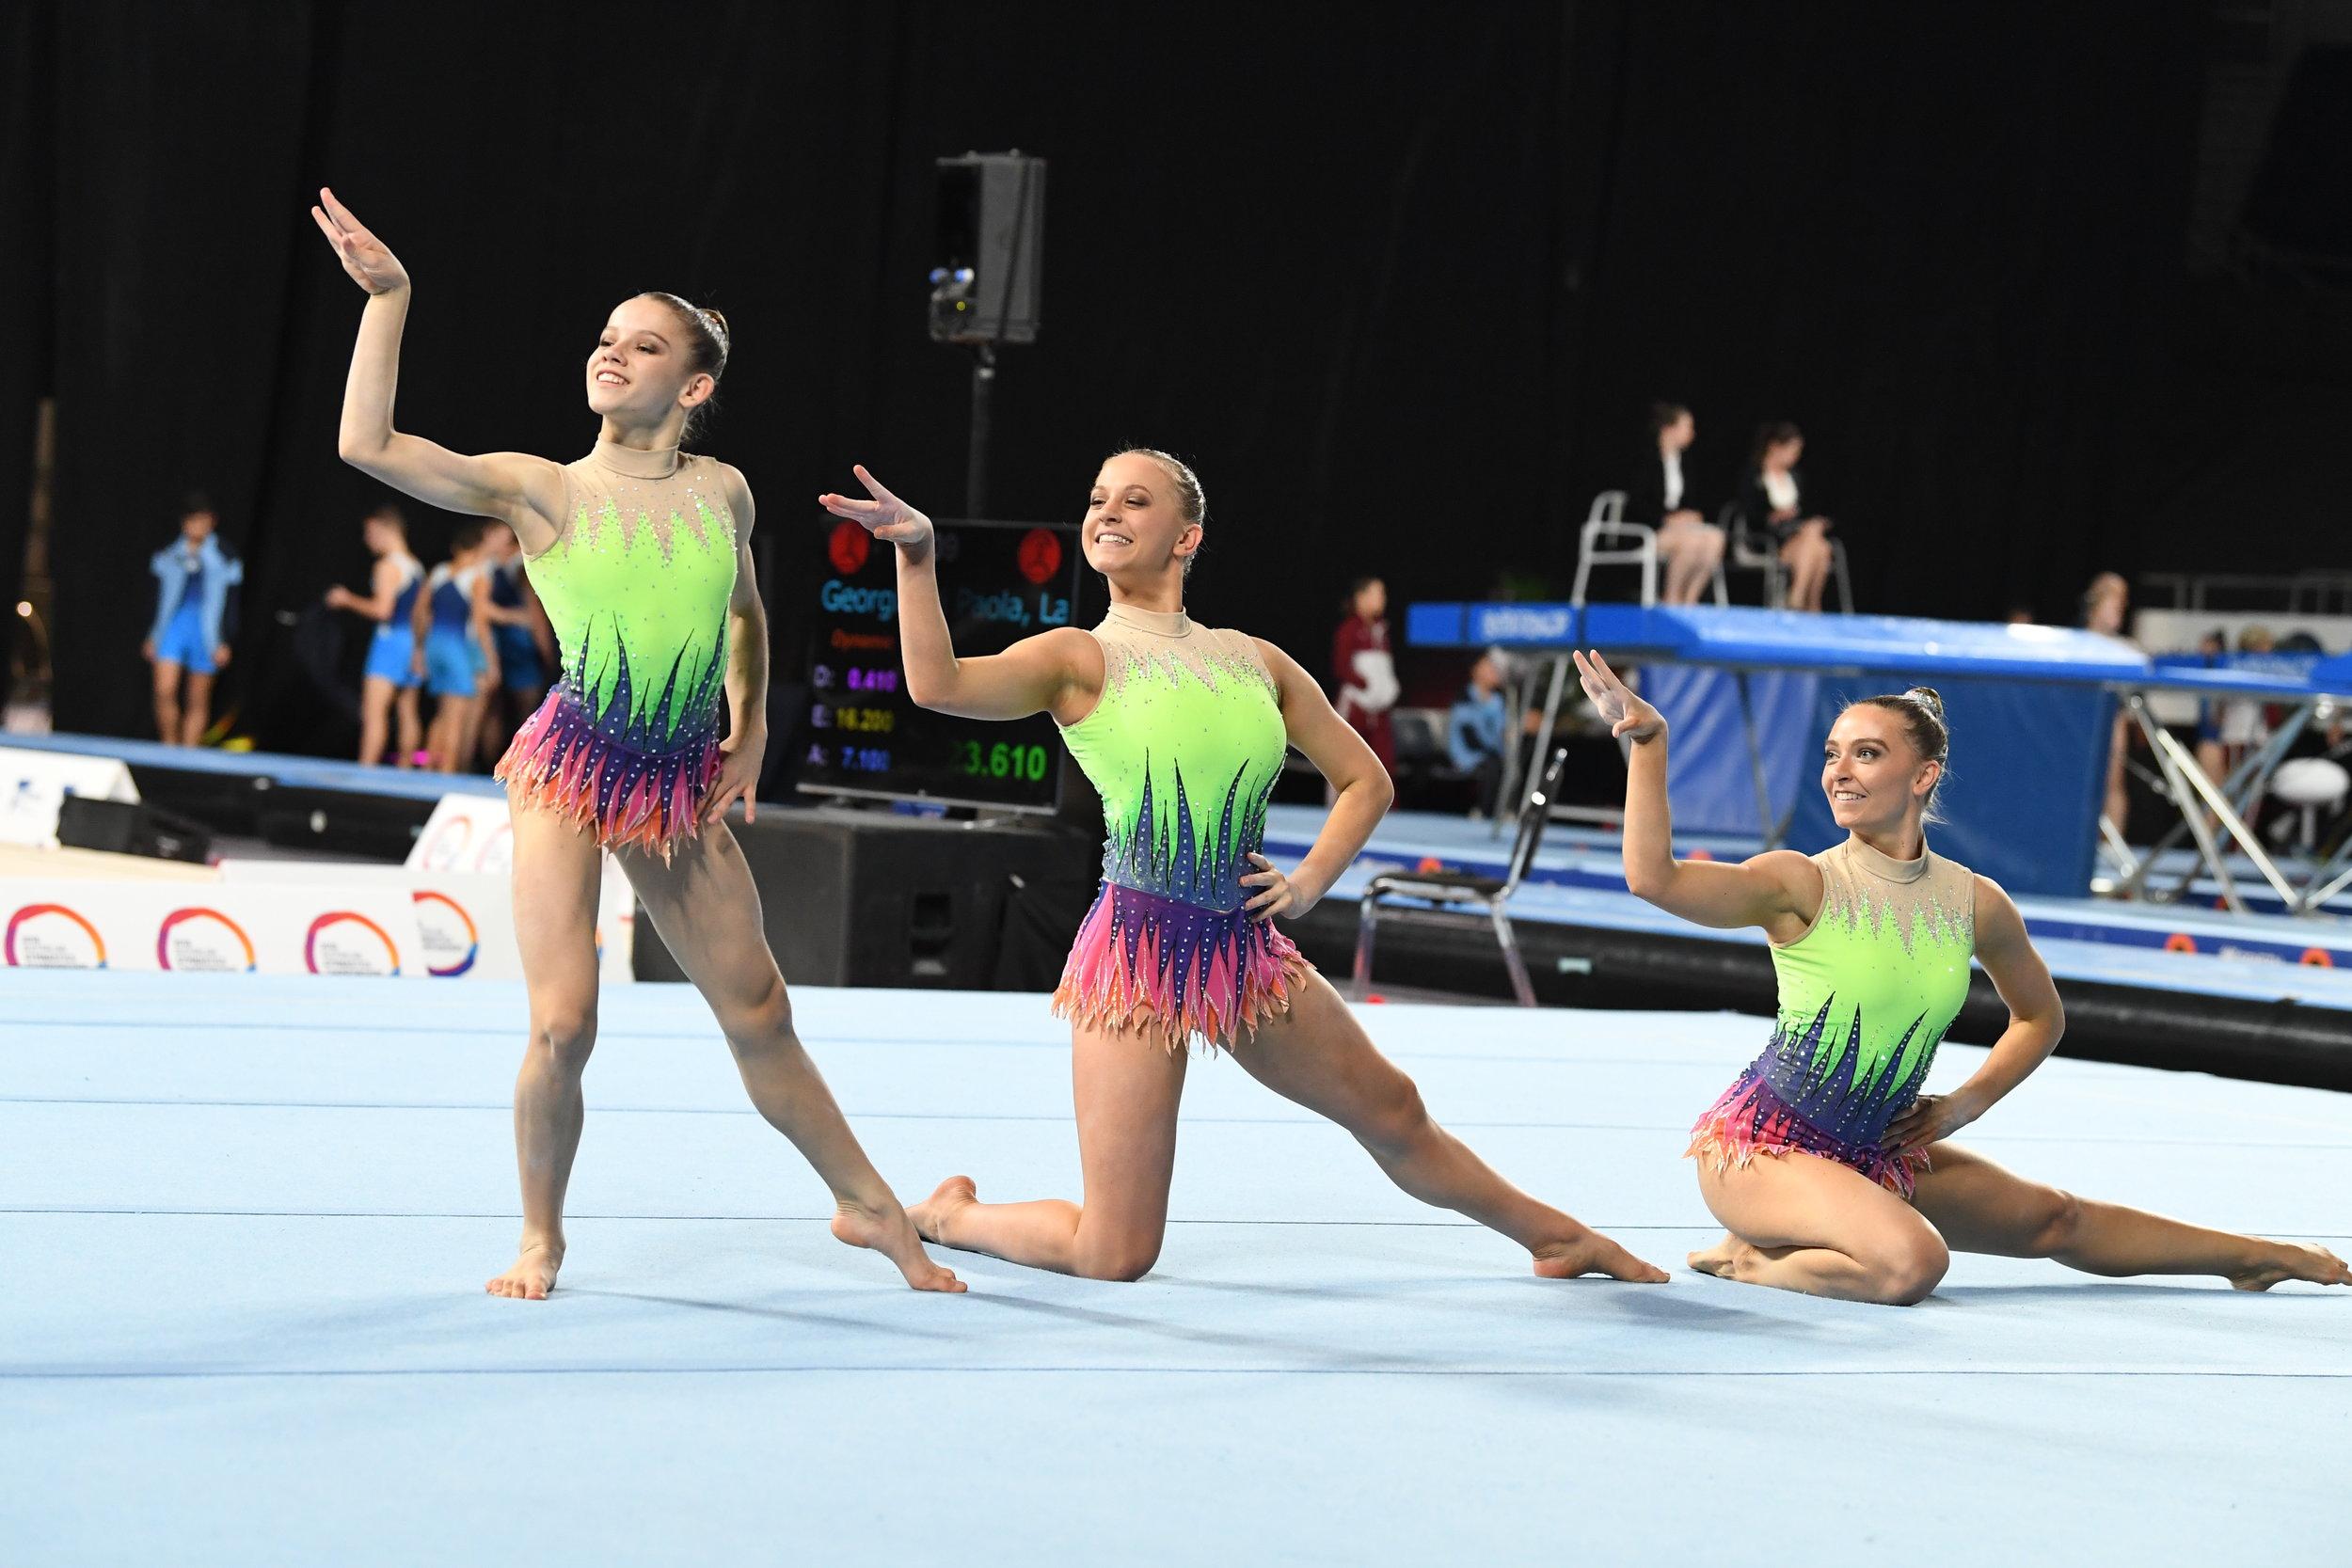 Competitive Acrobatic Gymnastics - ACROBATIC GYMNASTICS LEVELS 1 - INTERNATIONAL